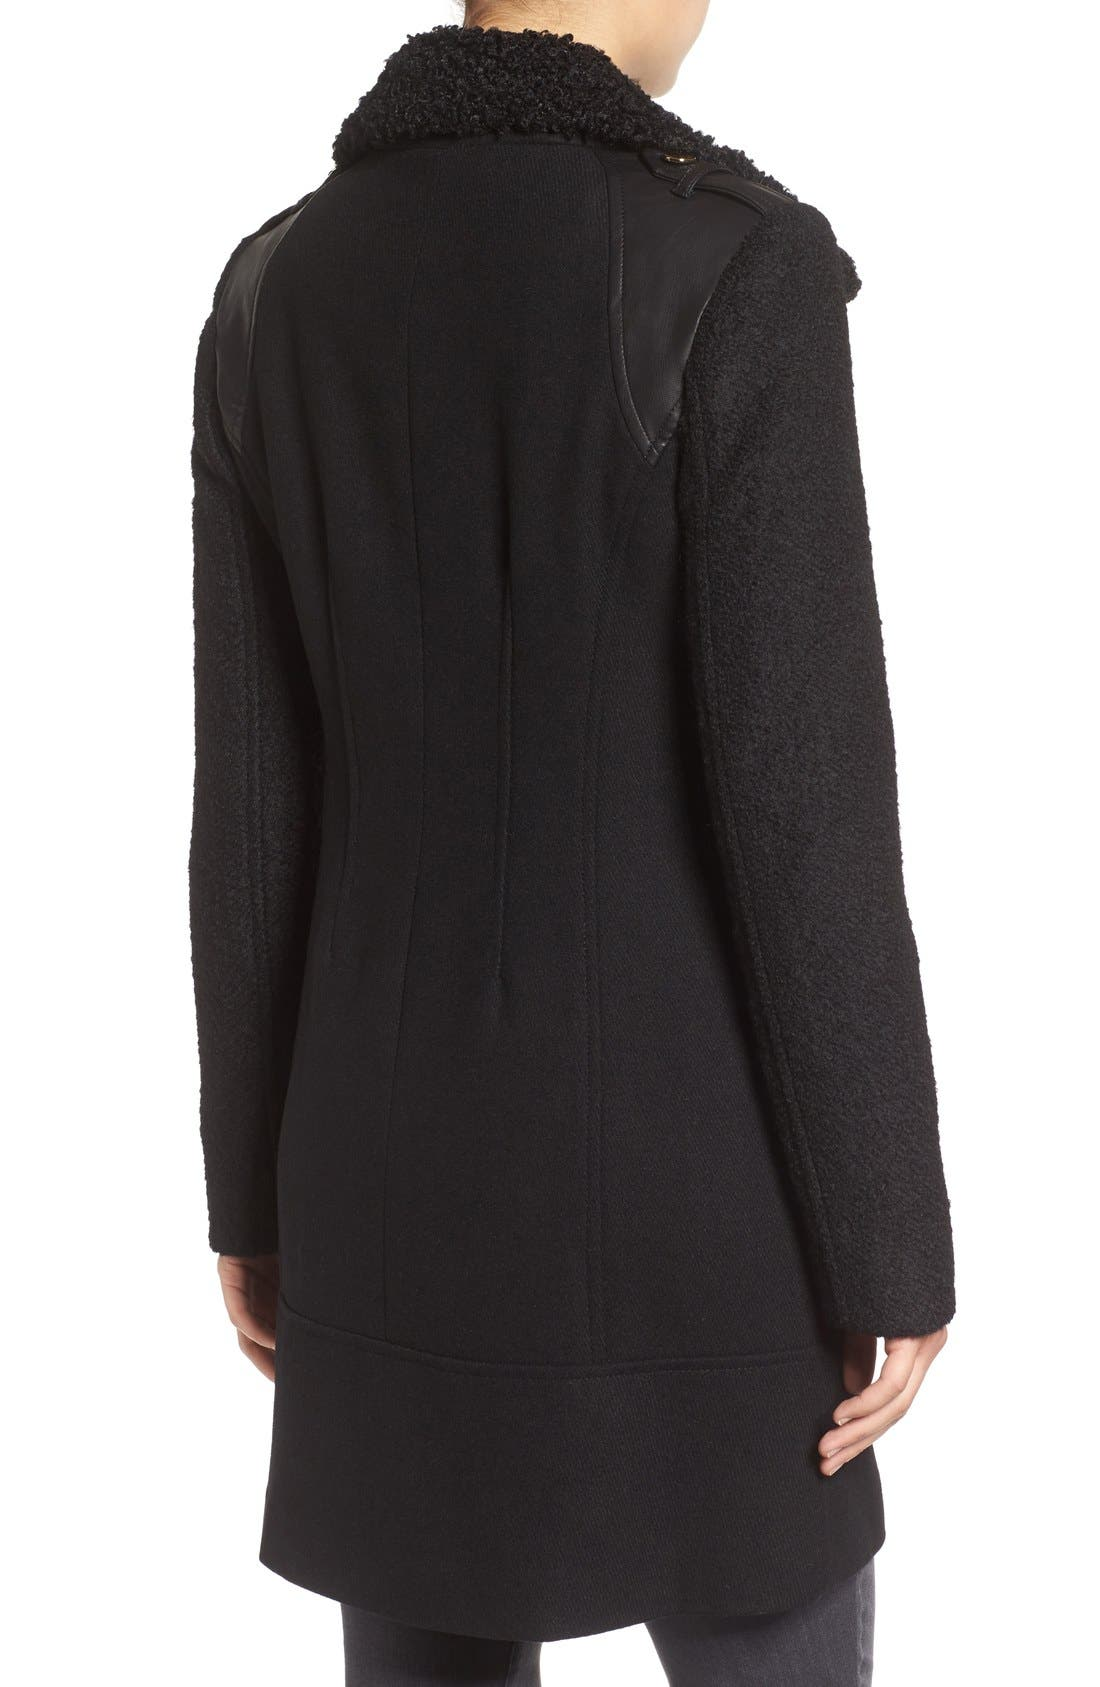 Bouclé Sleeve Wool Blend Military Coat,                             Alternate thumbnail 4, color,                             001